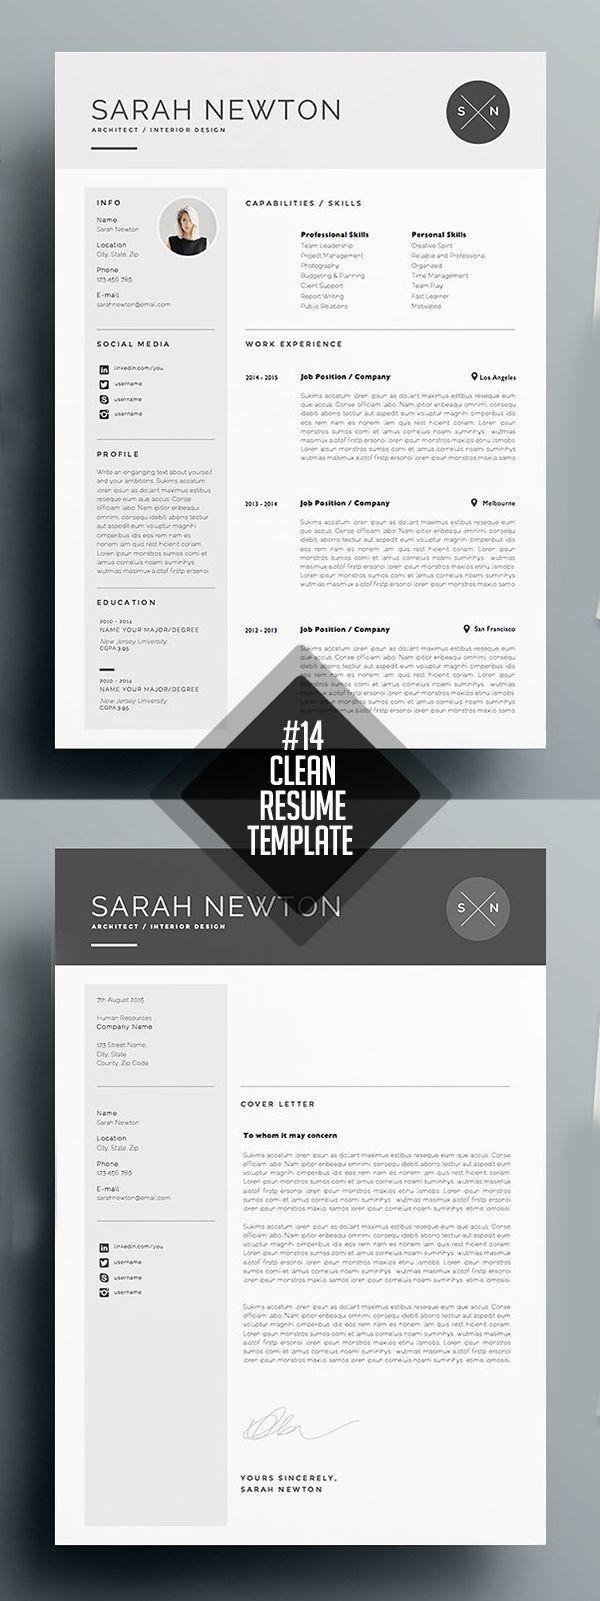 Resume Cv Template Cleanresume Cvresume Downloadresume Minimalresume Minimalist Photoshopresume Resumetemplates Exemple Cv Resume Document